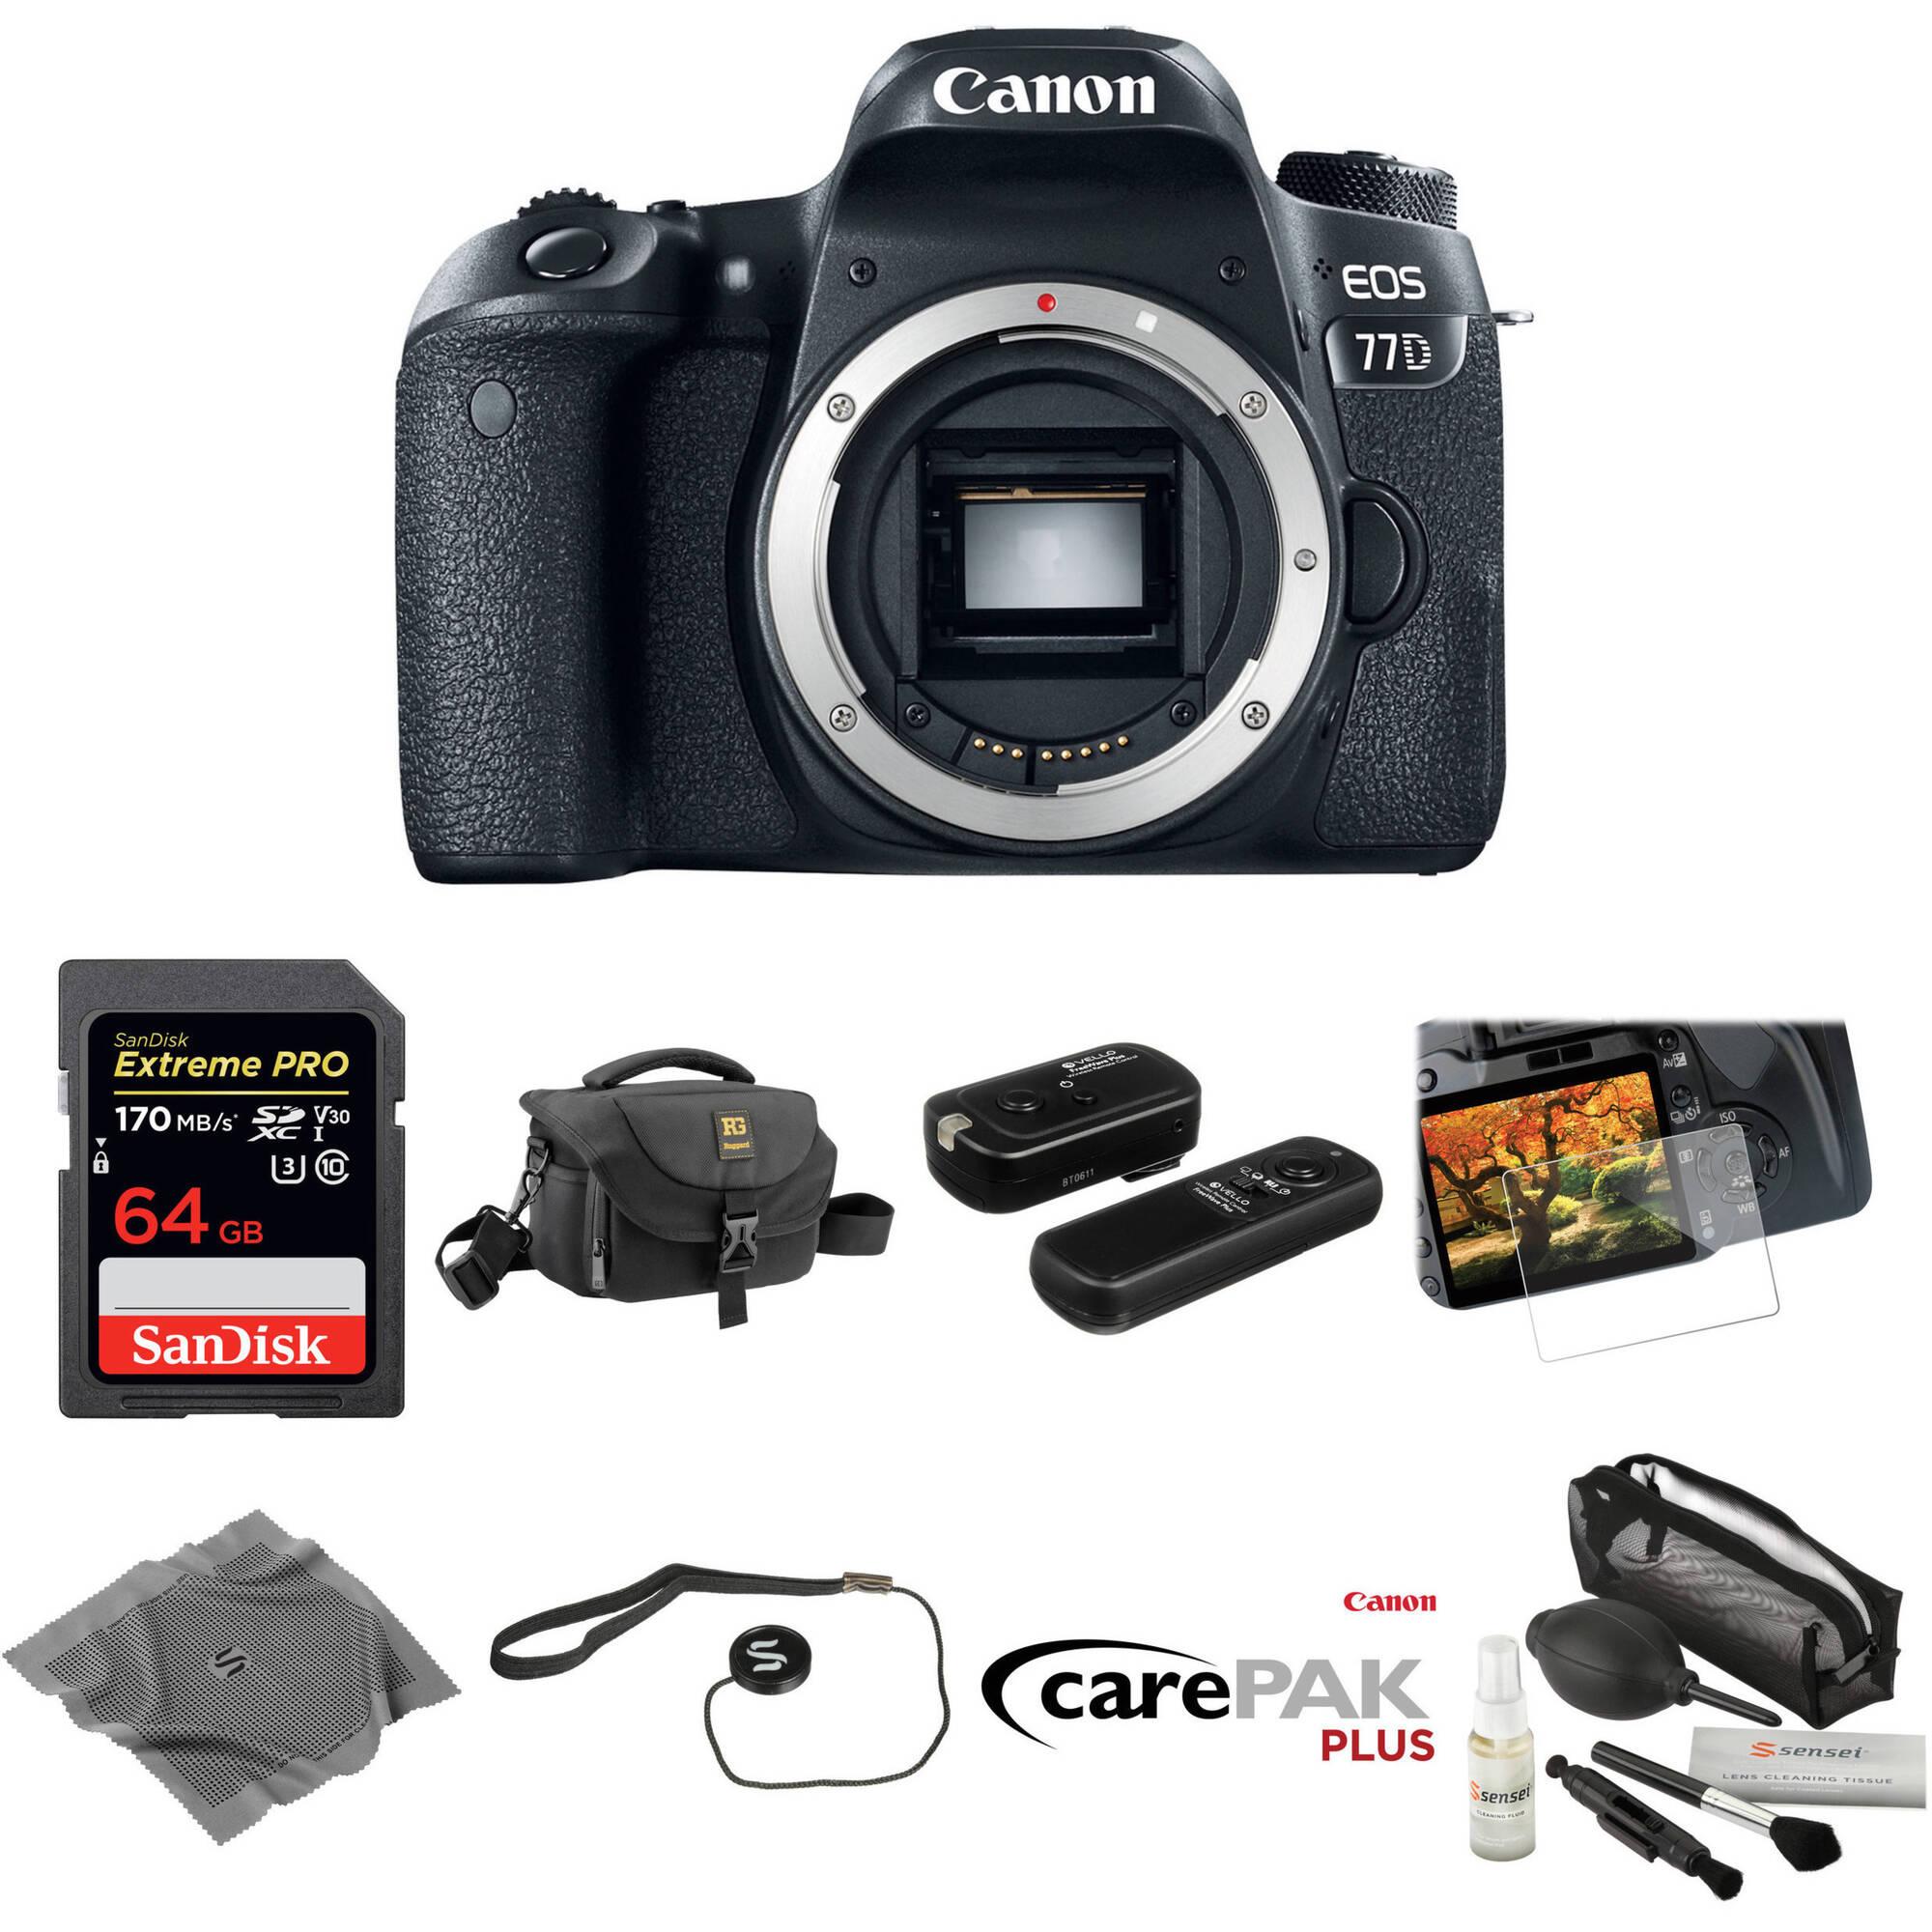 Movo Photo Lens Mount Cap /& Body Cap for Canon EOS DSLR Camera 2 Pack